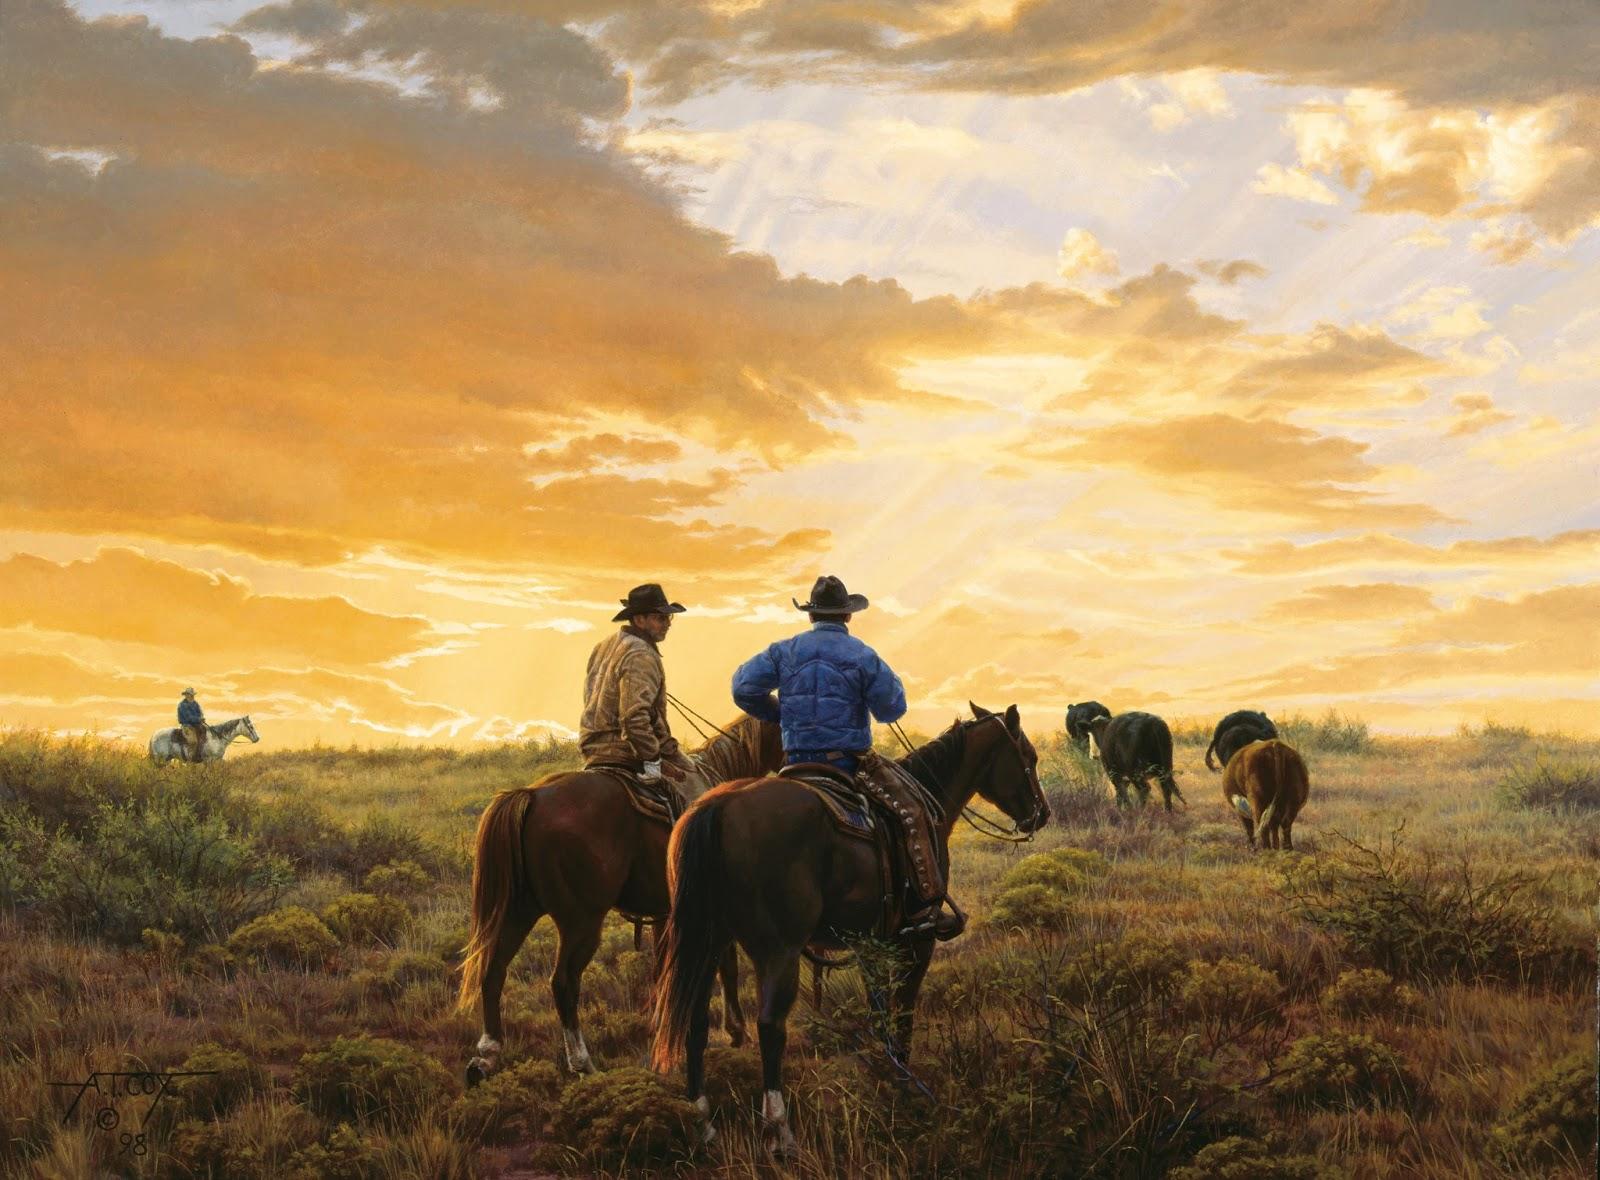 Pinturas de Tim Cox | O Pintor de Cavalos